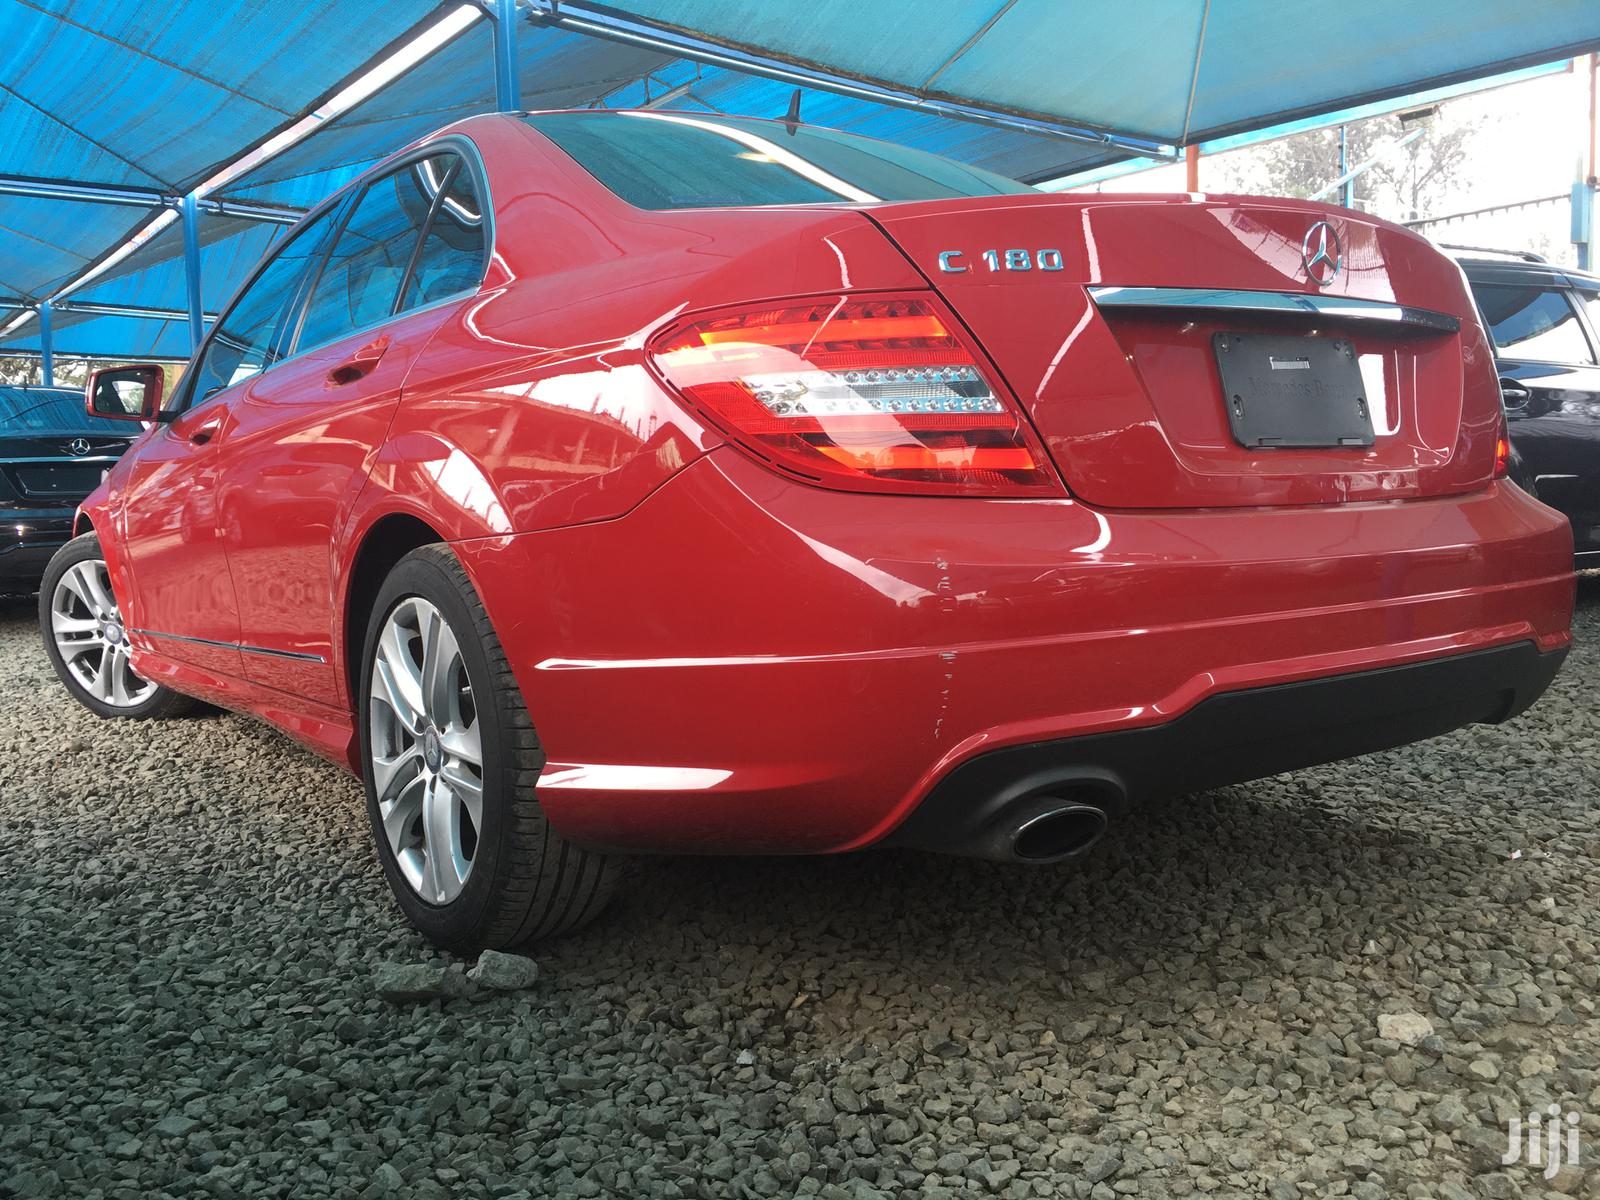 Mercedes-Benz C180 2013 Red | Cars for sale in Kilimani, Nairobi, Kenya